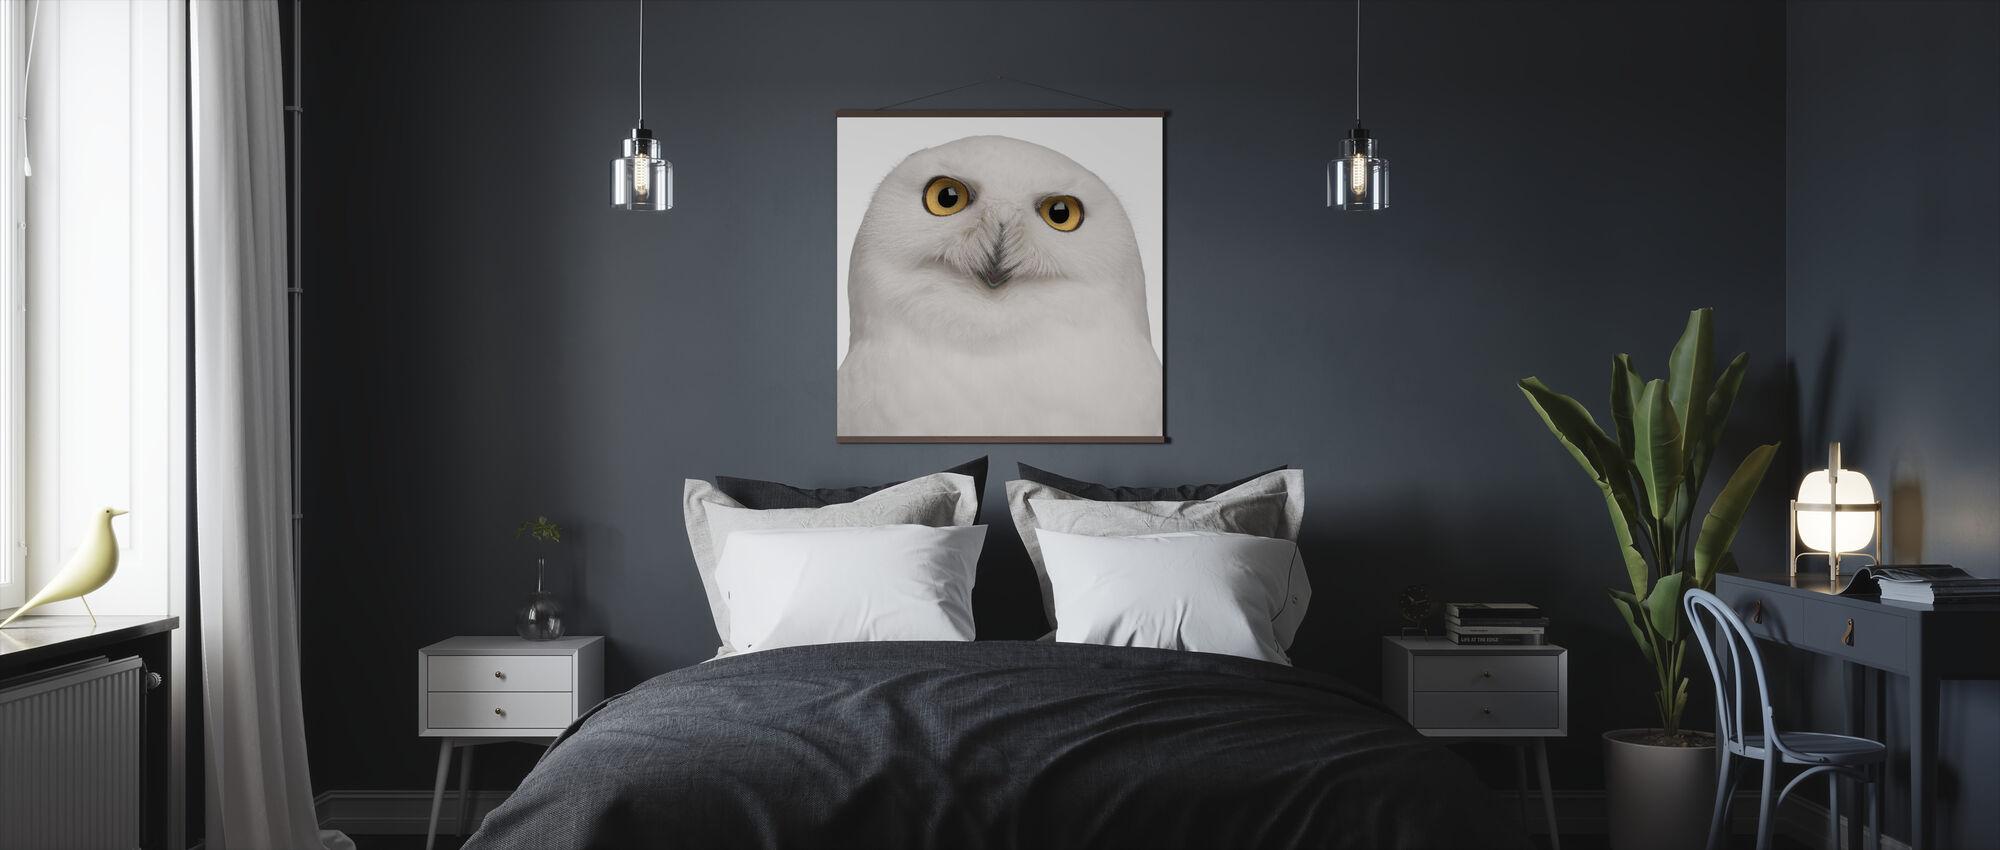 Snowy Owl - Poster - Bedroom